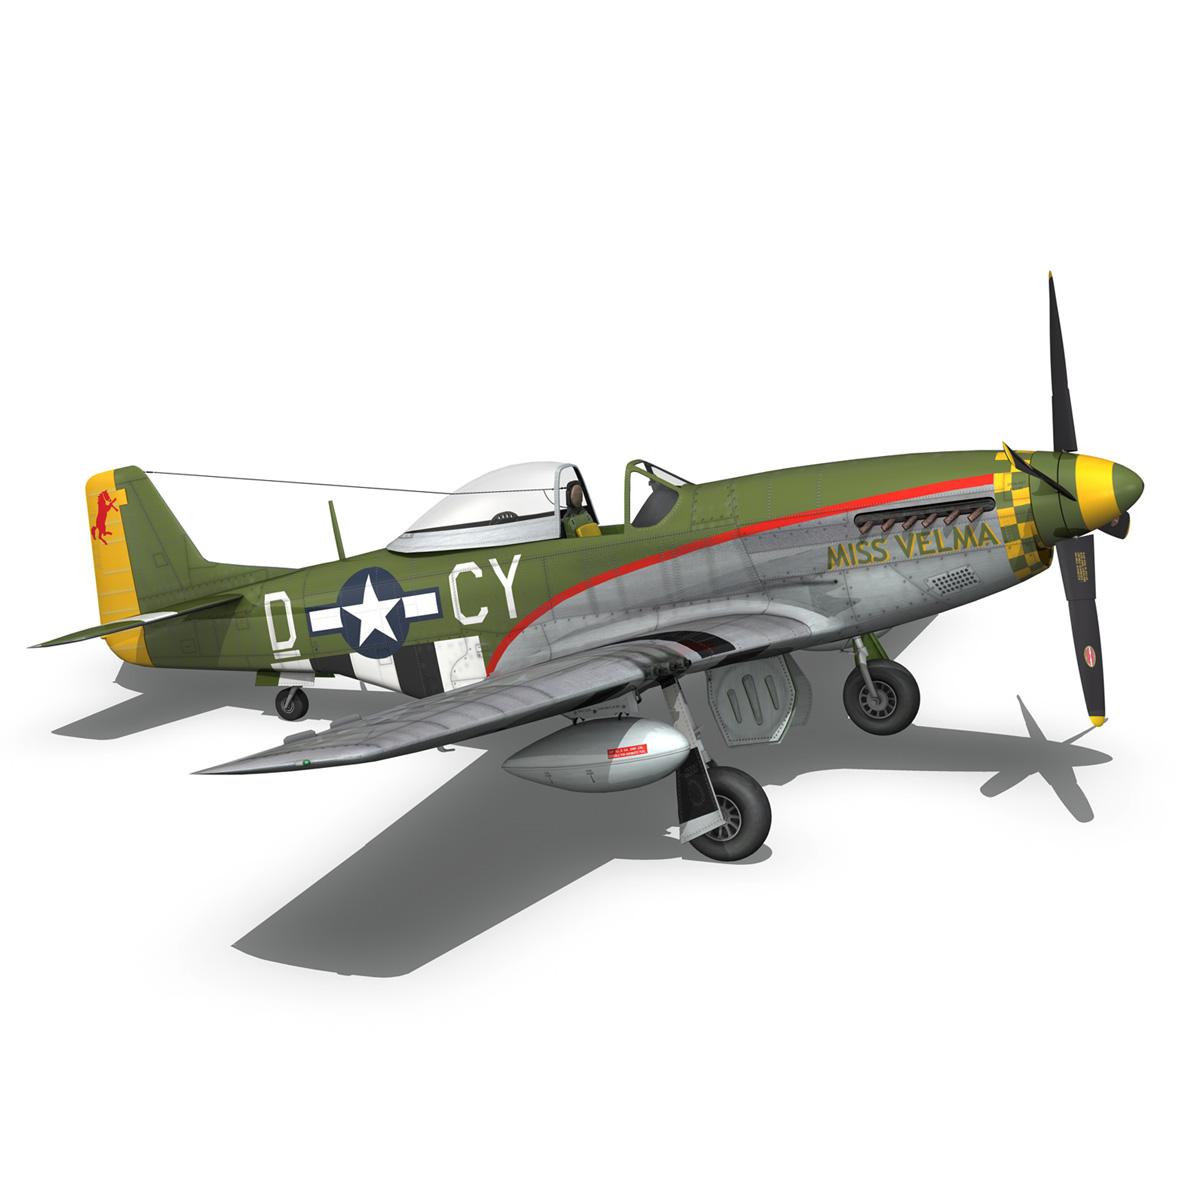 north american p-51d – mustang – miss velma 3d model 3ds fbx c4d lwo obj 267631